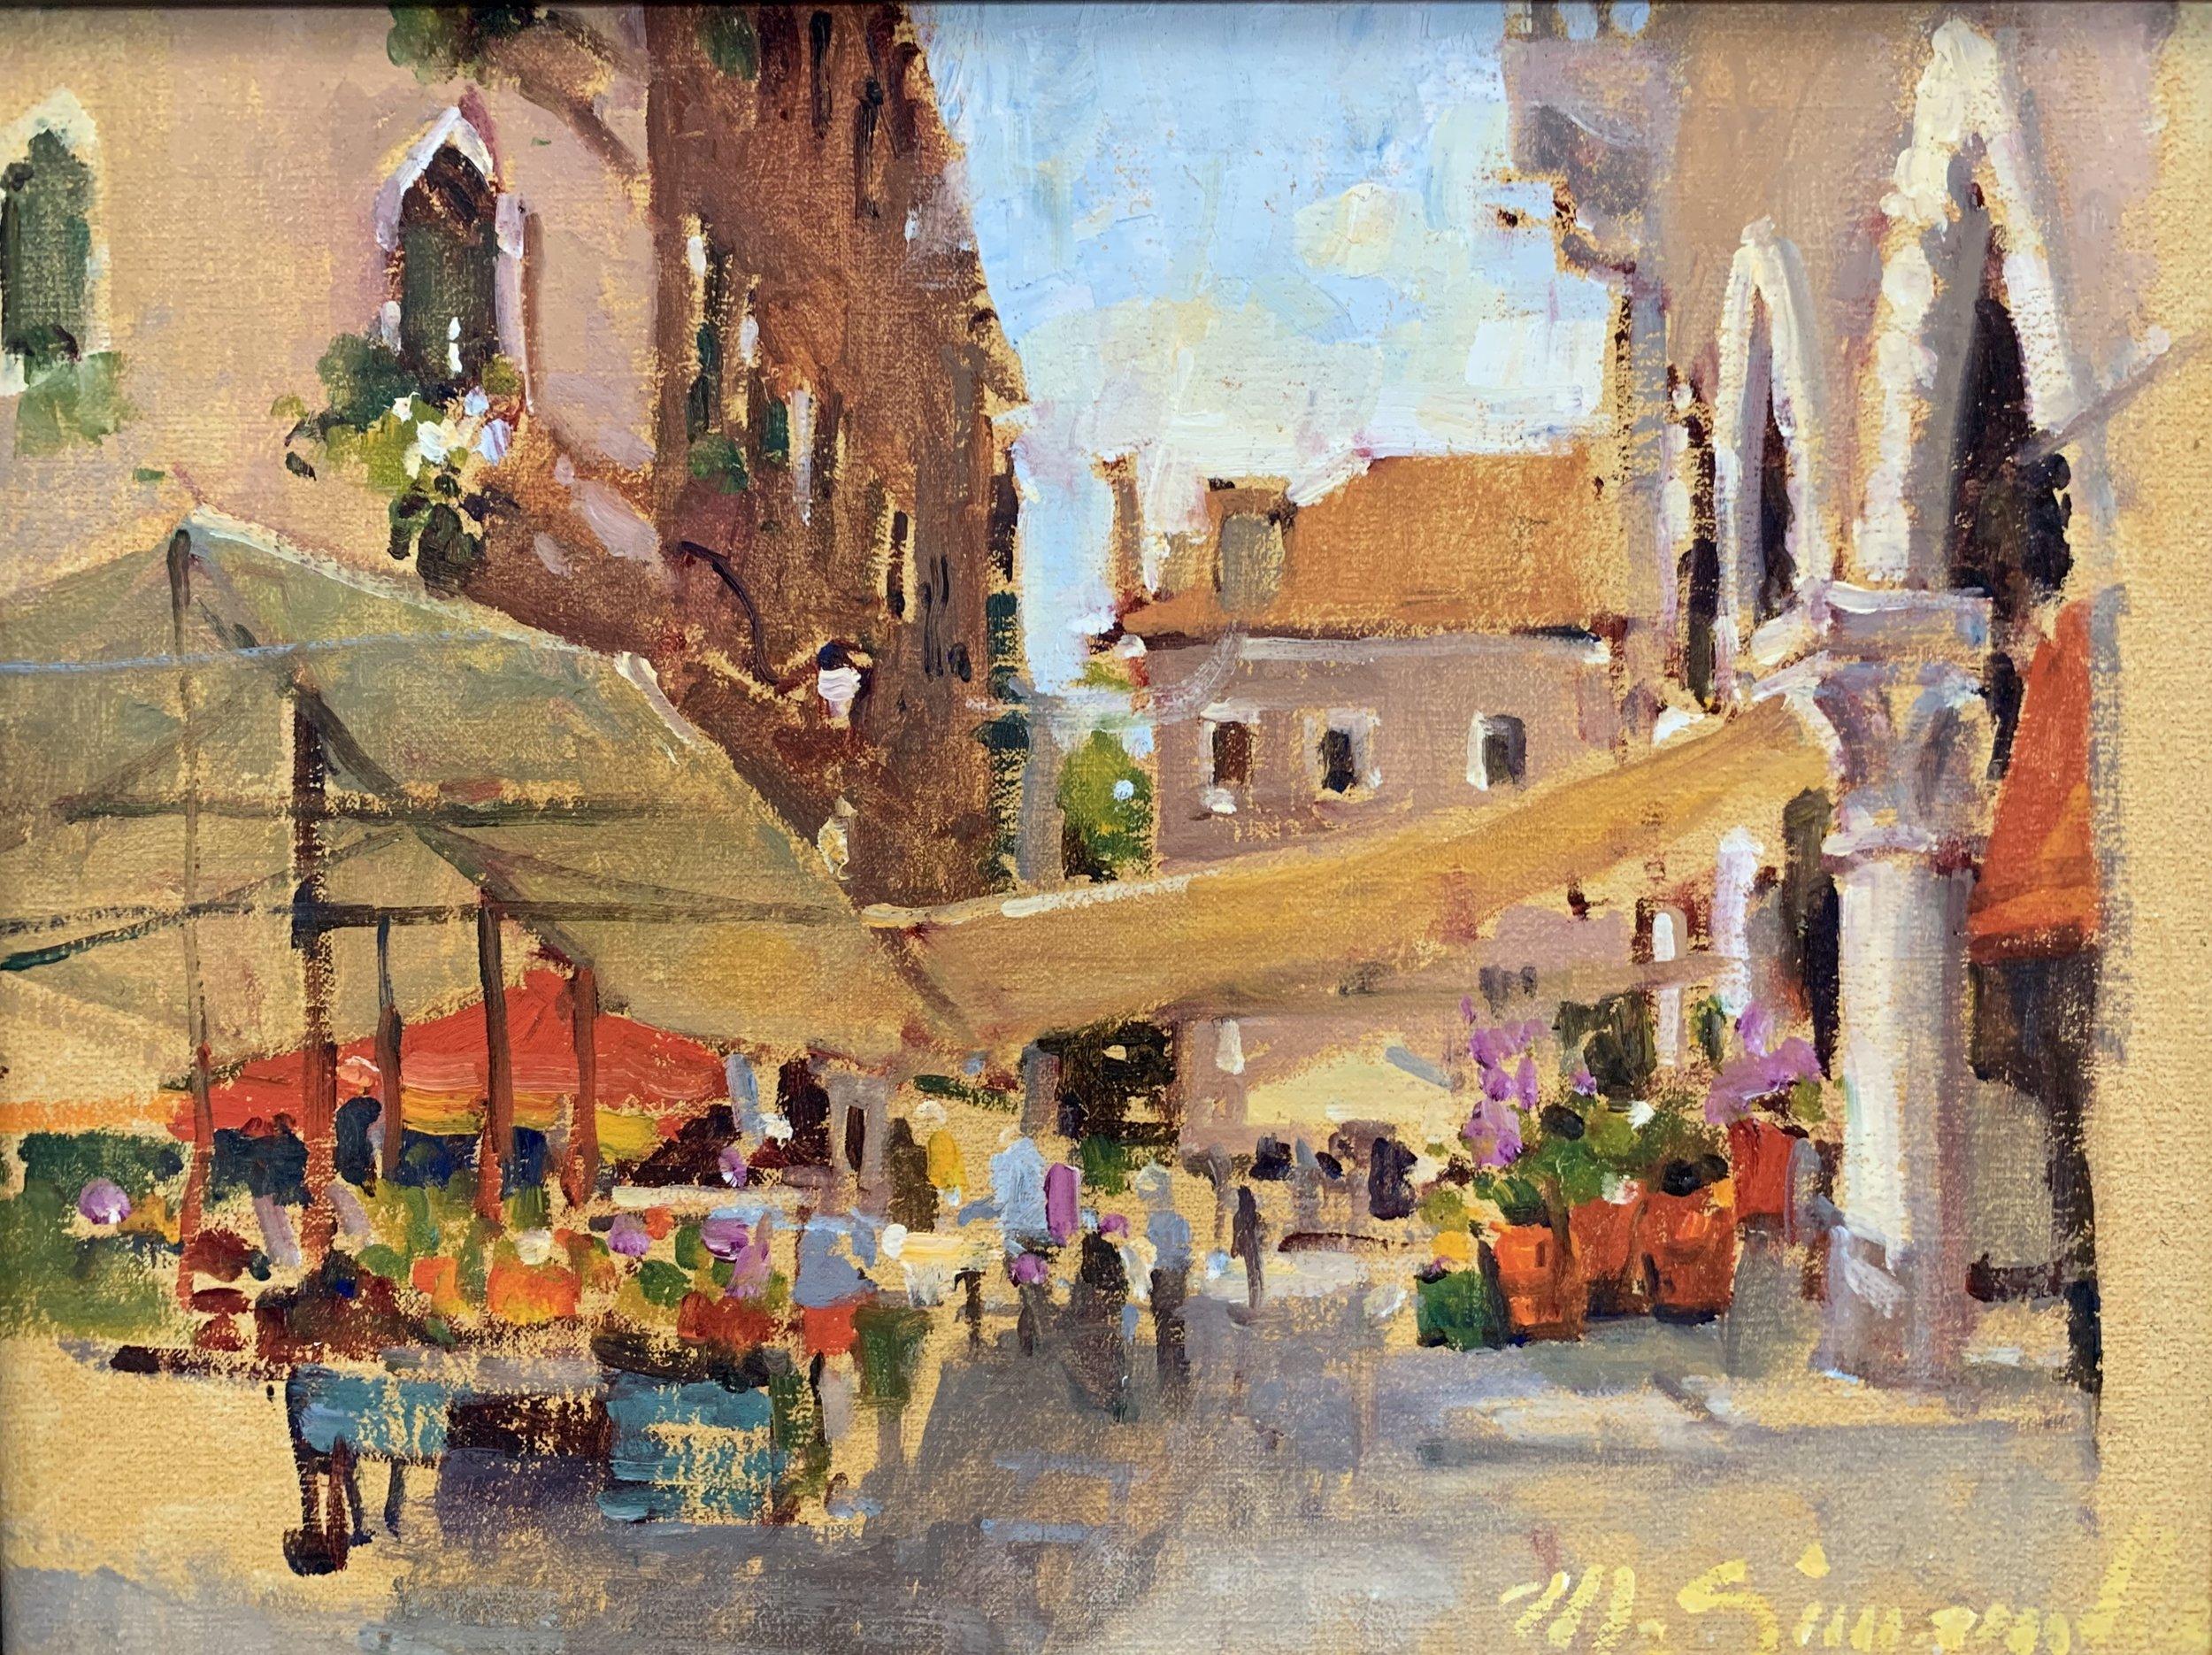 Fish Market Venice 12 x 16